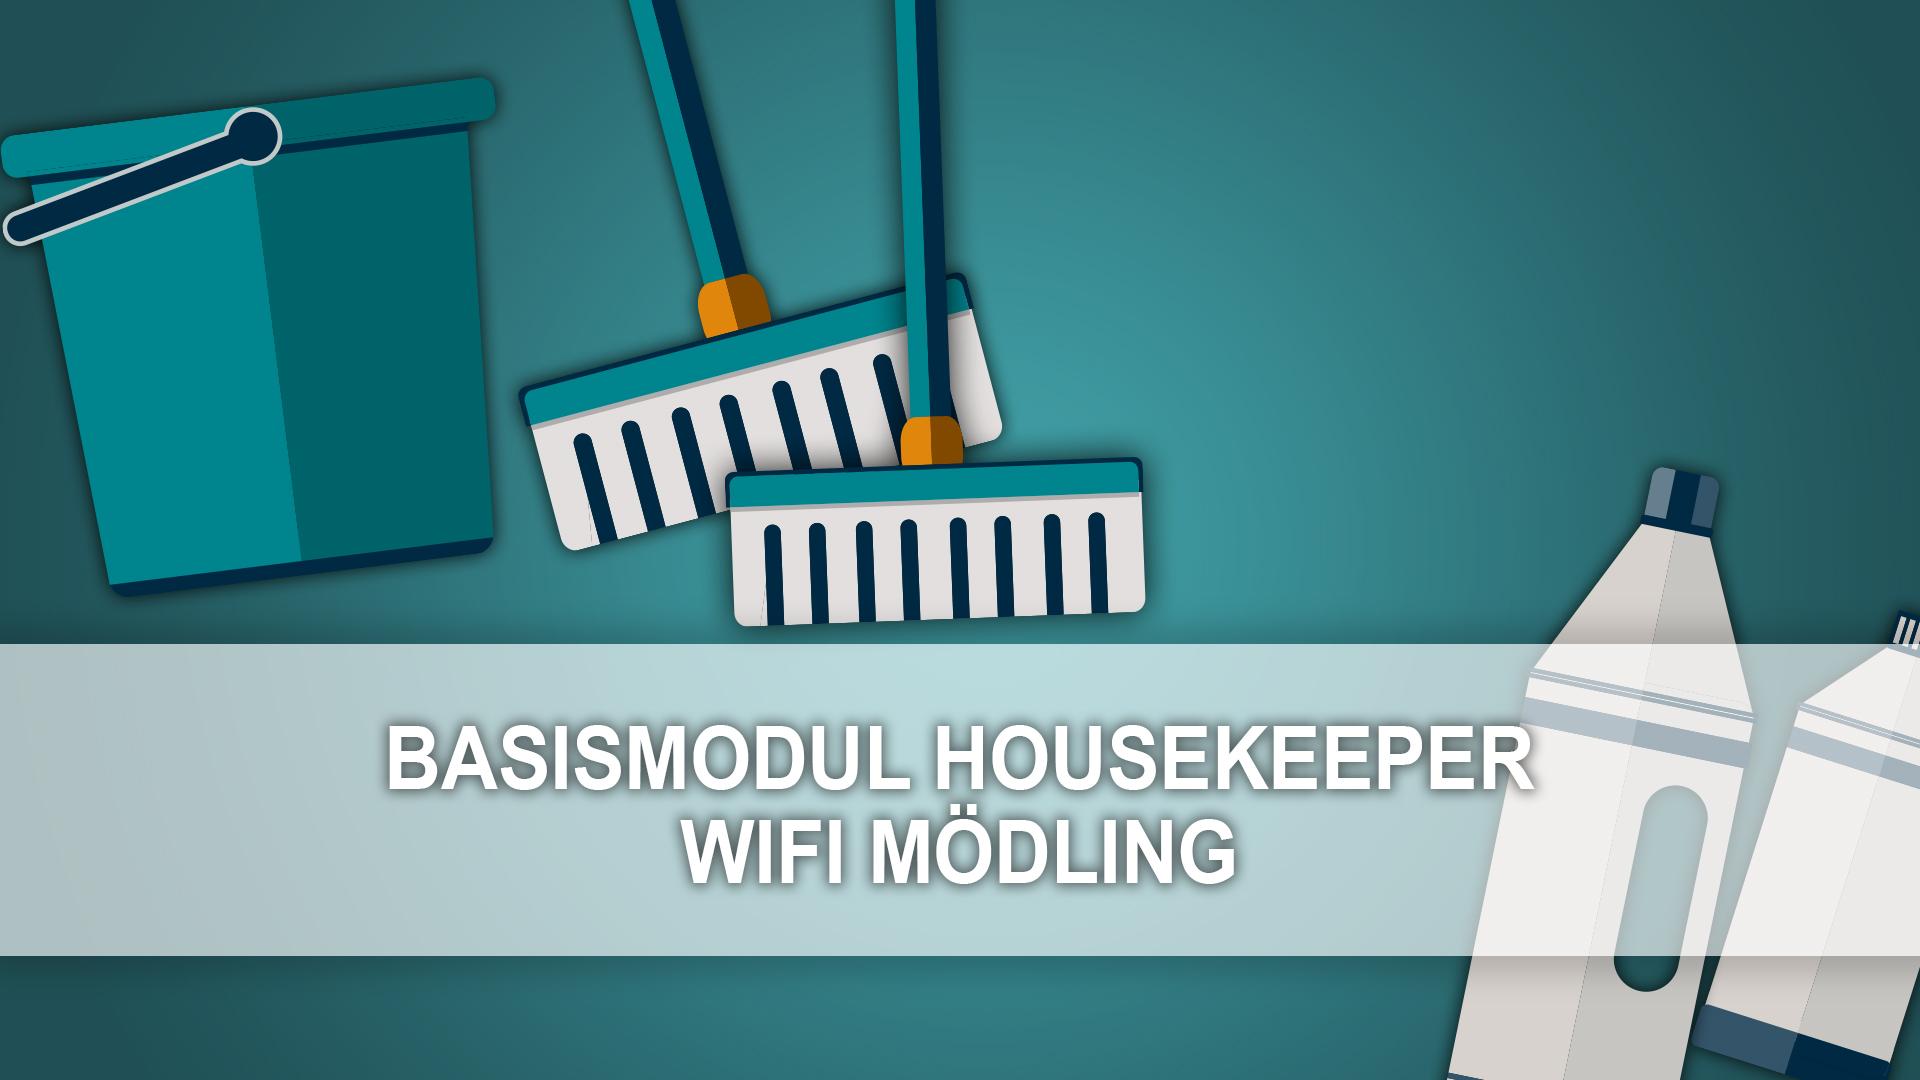 Basismodul Housekeeping am WIFI Mödling | A.SCHEFFER Consulting